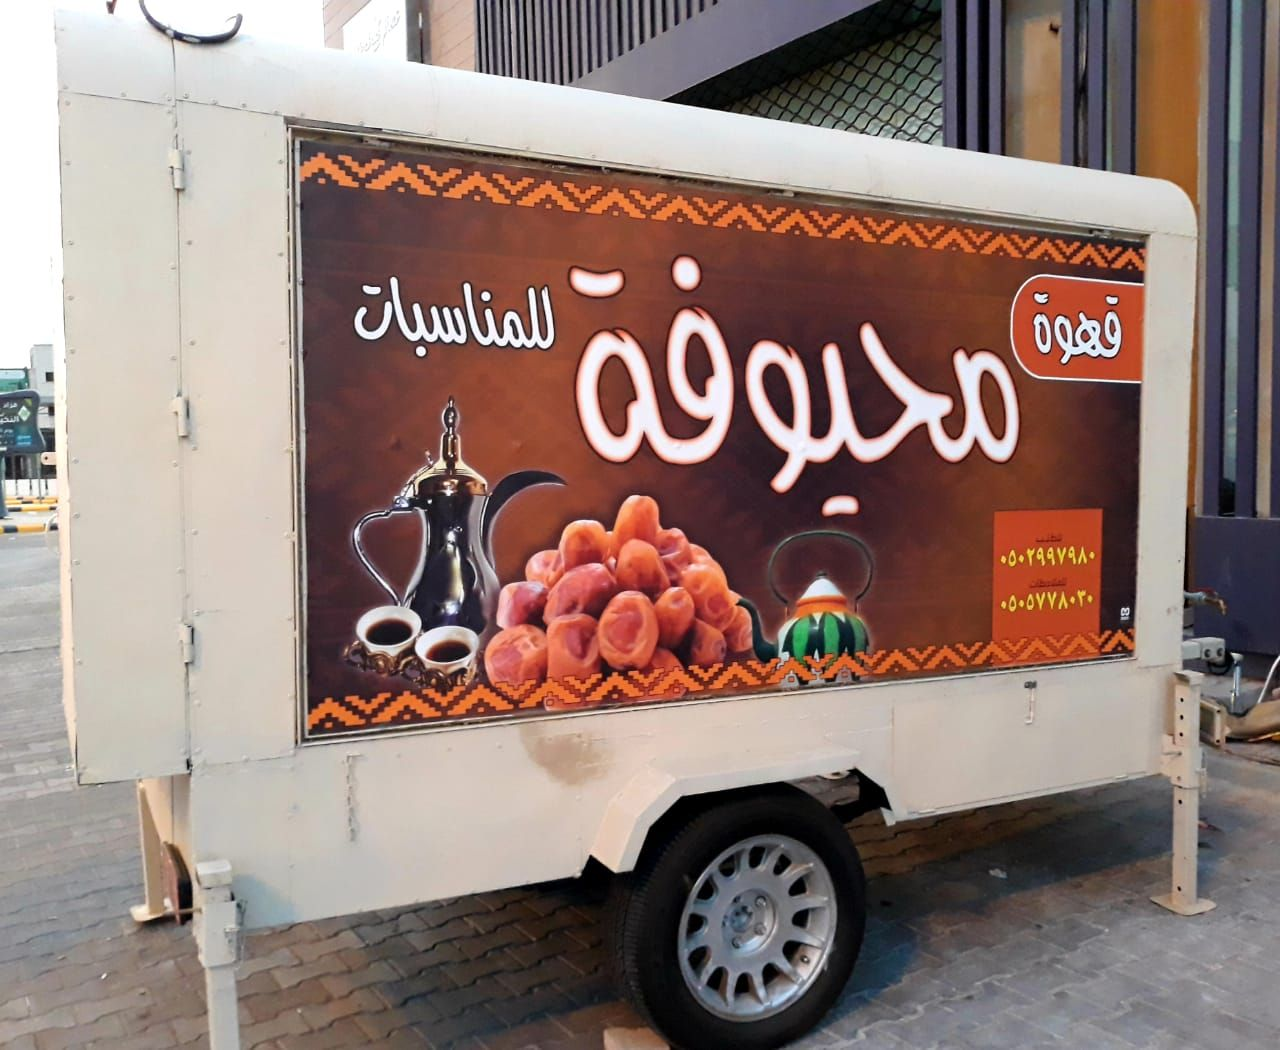 Pin By ممدوح للدعاية والإعلان Mamdouh On Car Stickers استيكرات سيارات Kitchen Appliances Kitchen Popcorn Maker